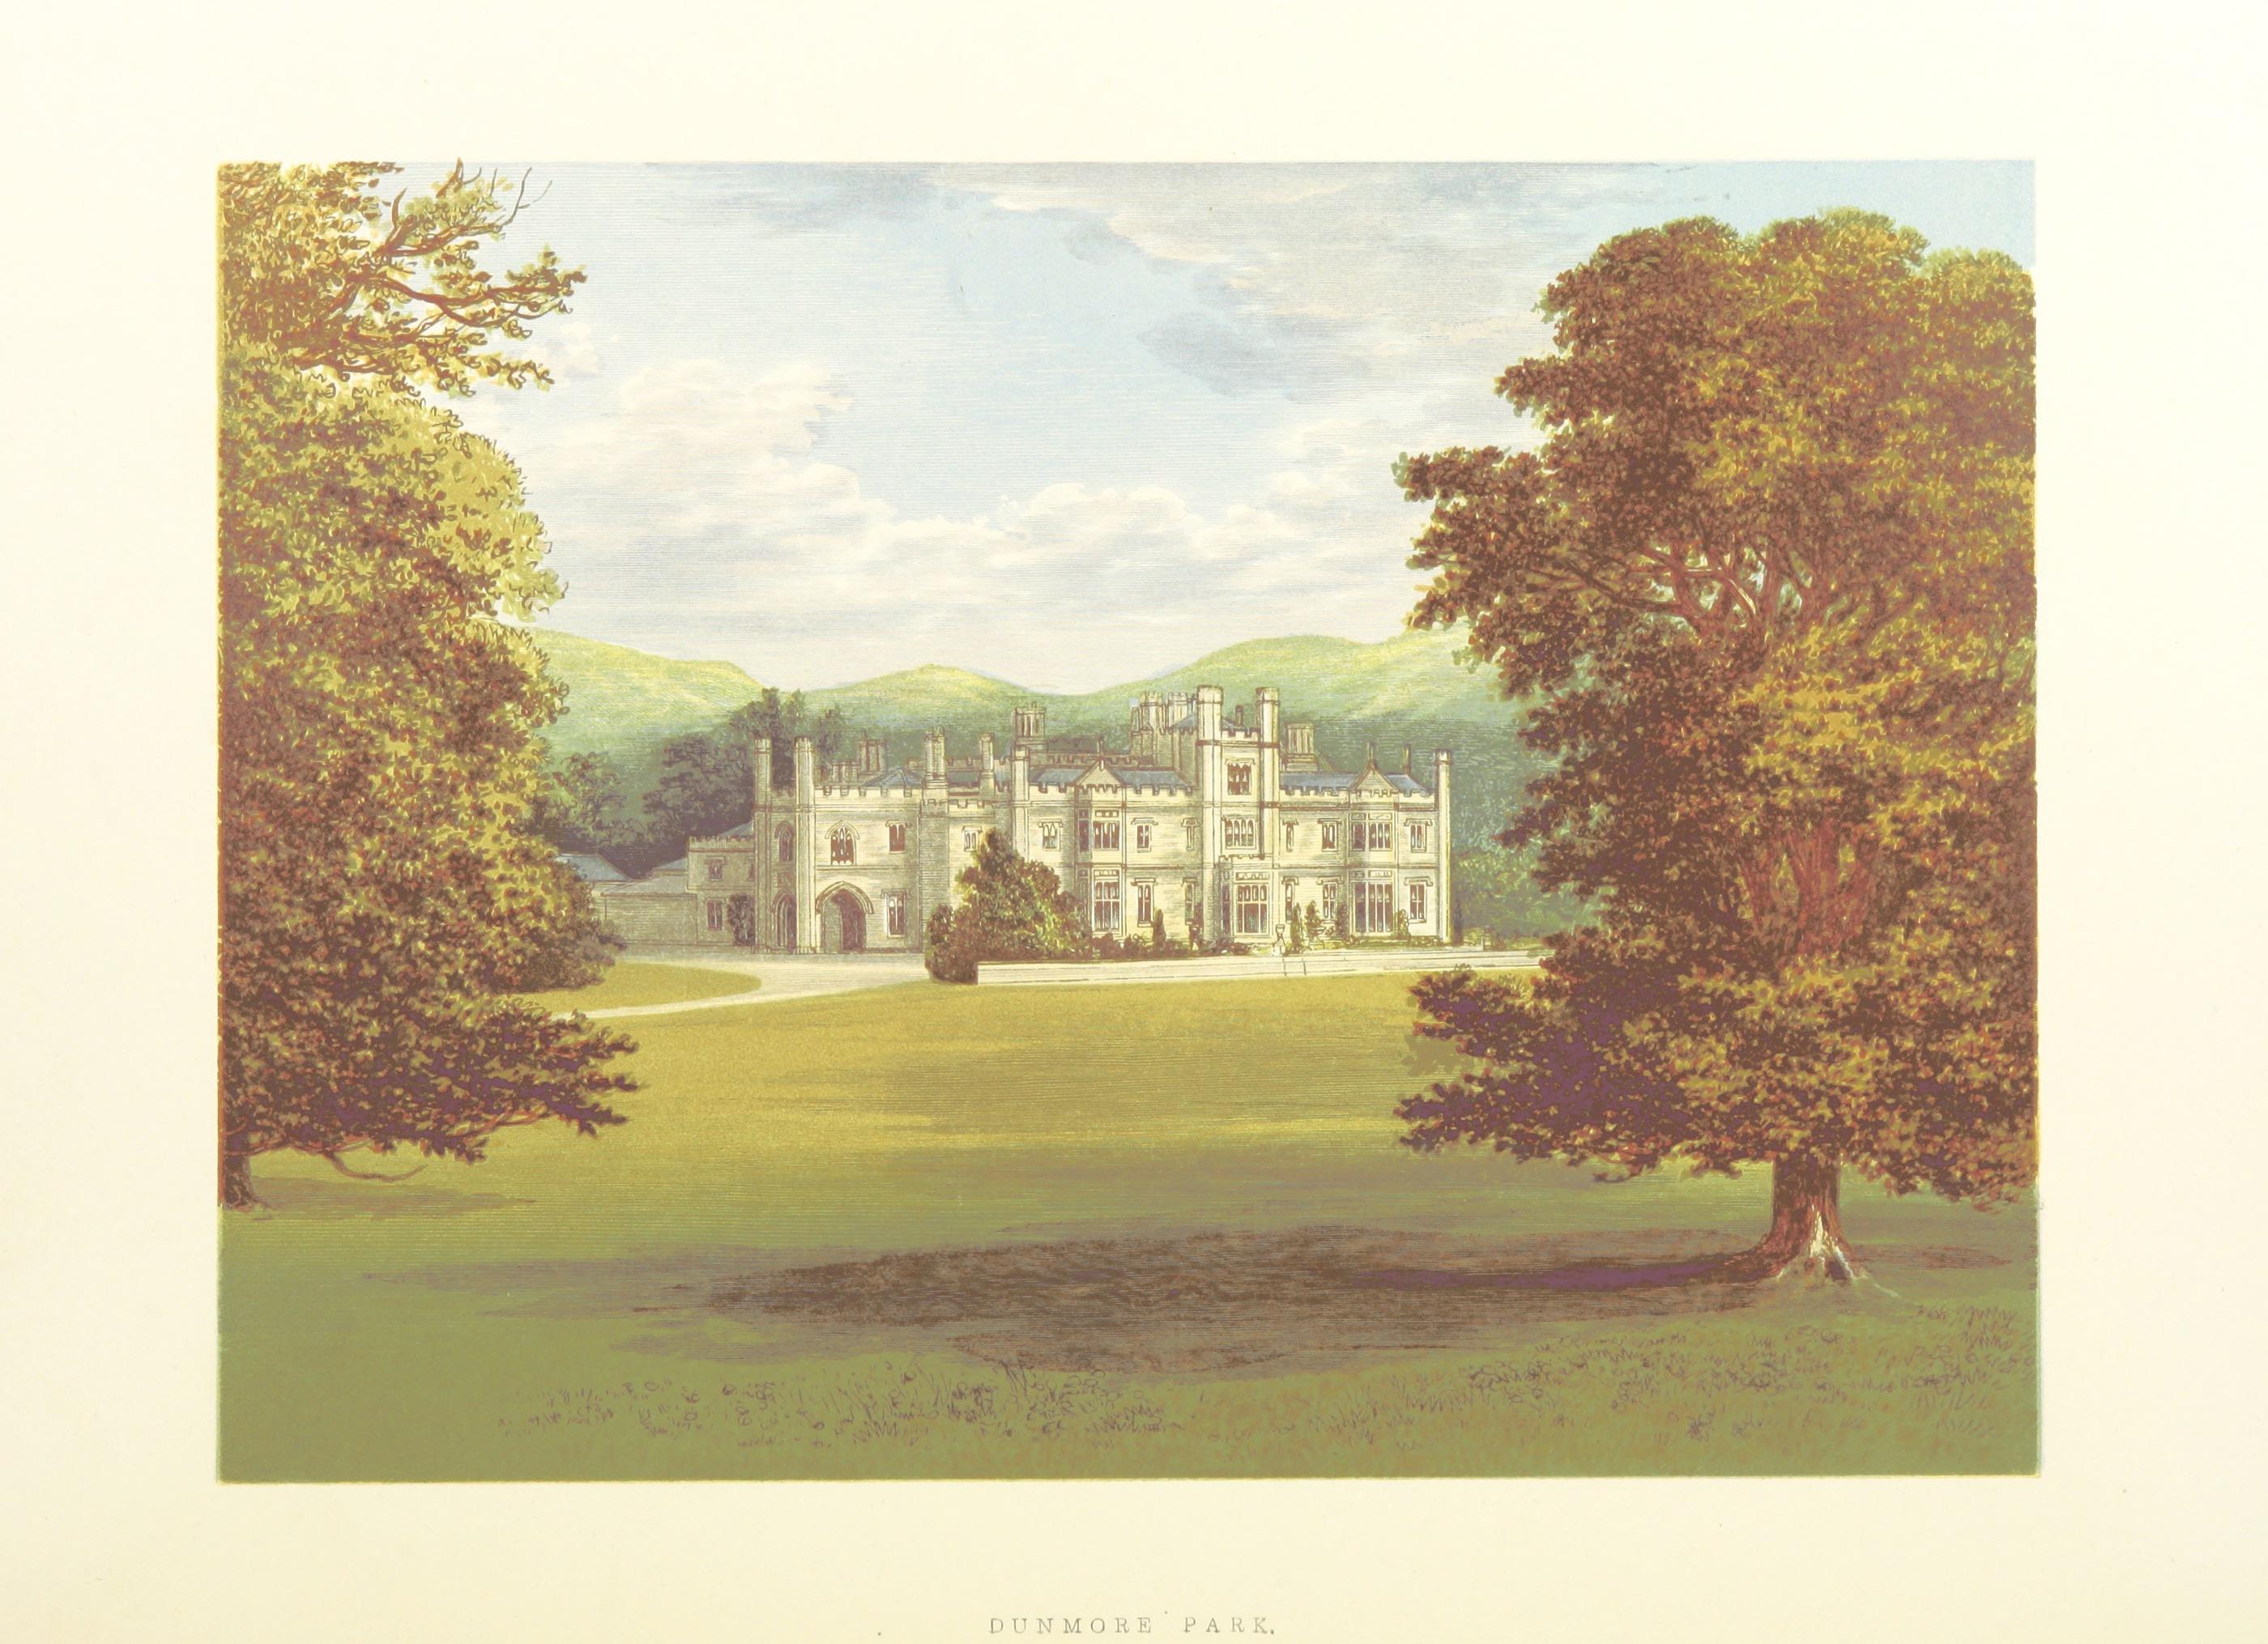 https://upload.wikimedia.org/wikipedia/commons/7/7f/CS_p5.364_-_Dunmore_Park%2C_Stirlingshire_-_Morris%27s_County_Seats%2C_1880.jpg